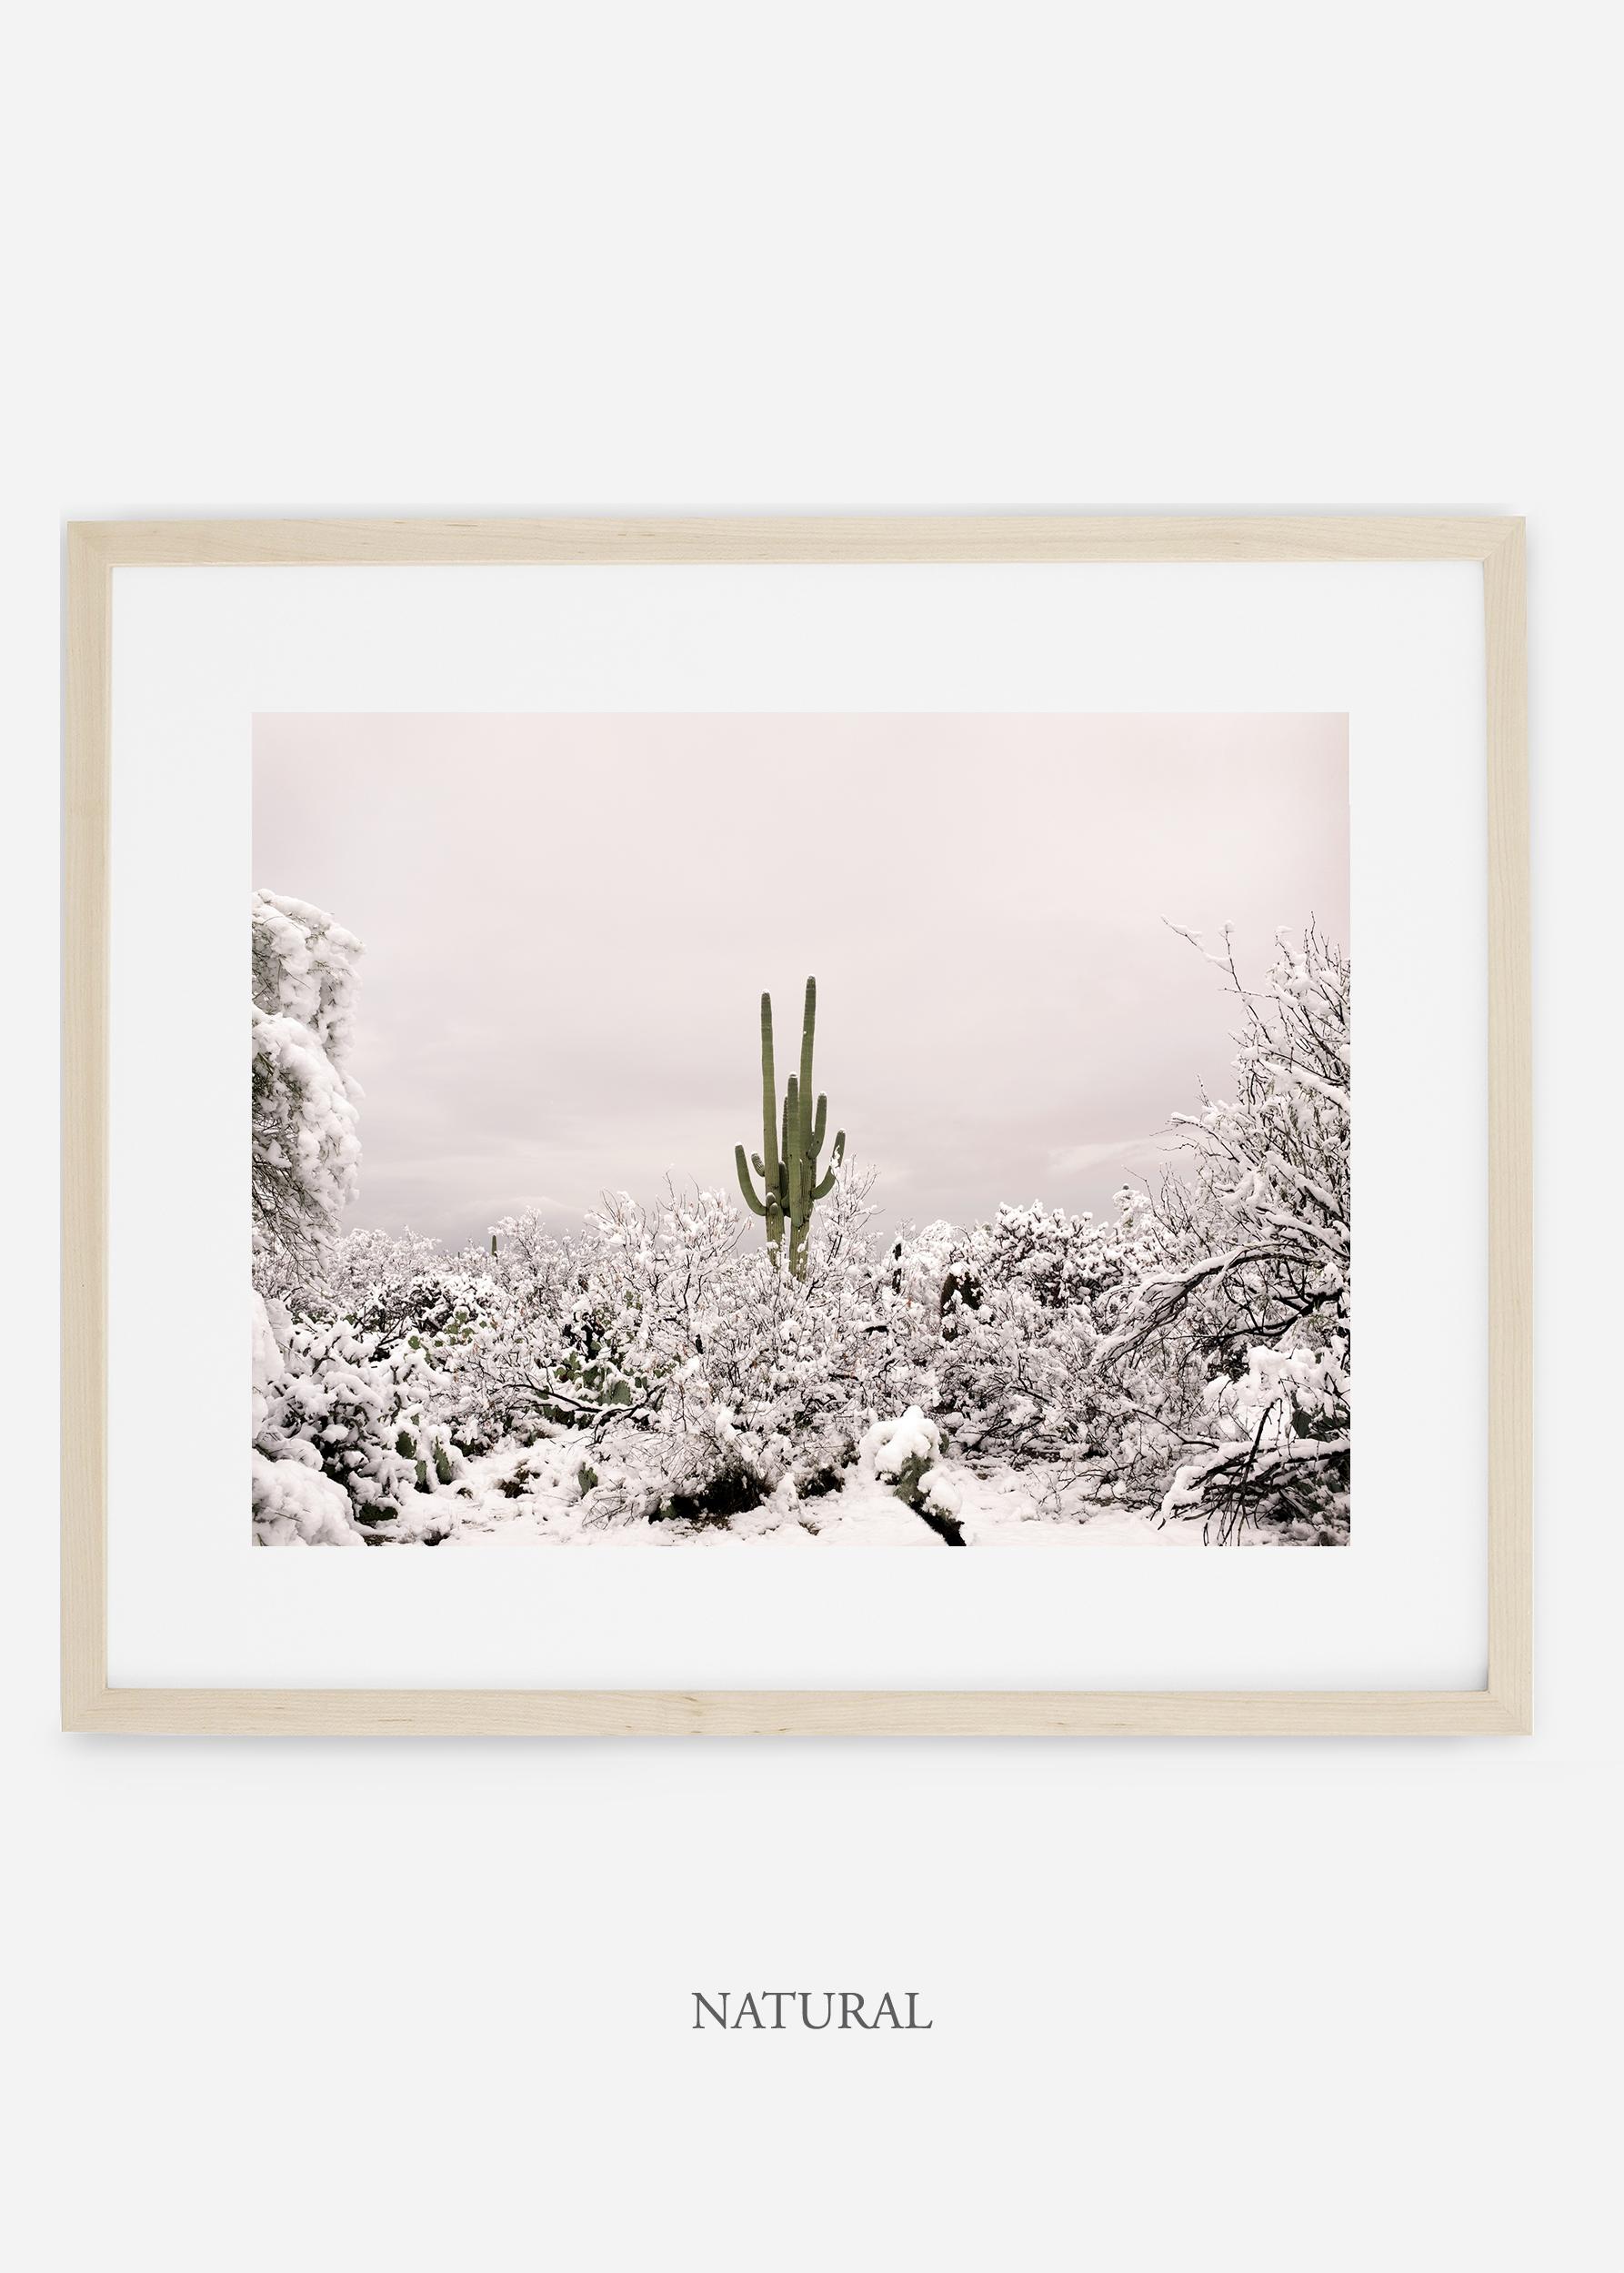 naturalframe-saguaroNo.1-wildercalifornia-art-wallart-cactusprint-homedecor-prints-arizona-botanical-artwork-interiordesign.jpg